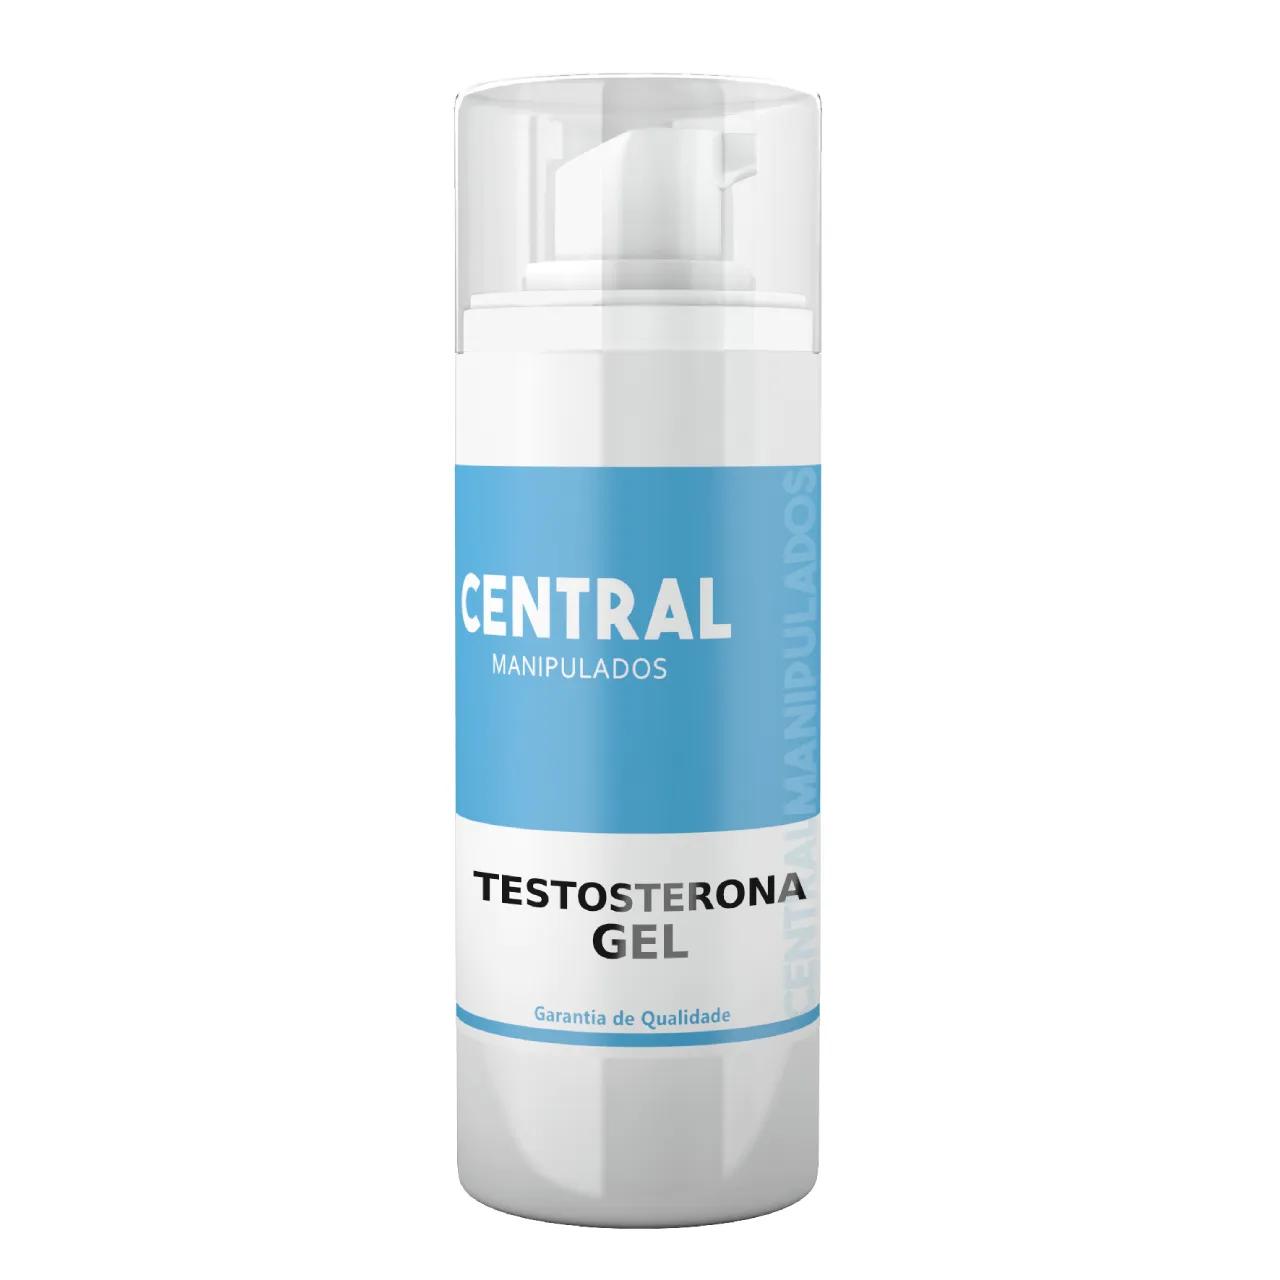 Testosterona em Gel Transdermico 50mg/ml - Frasco com 30ml - Pentravan